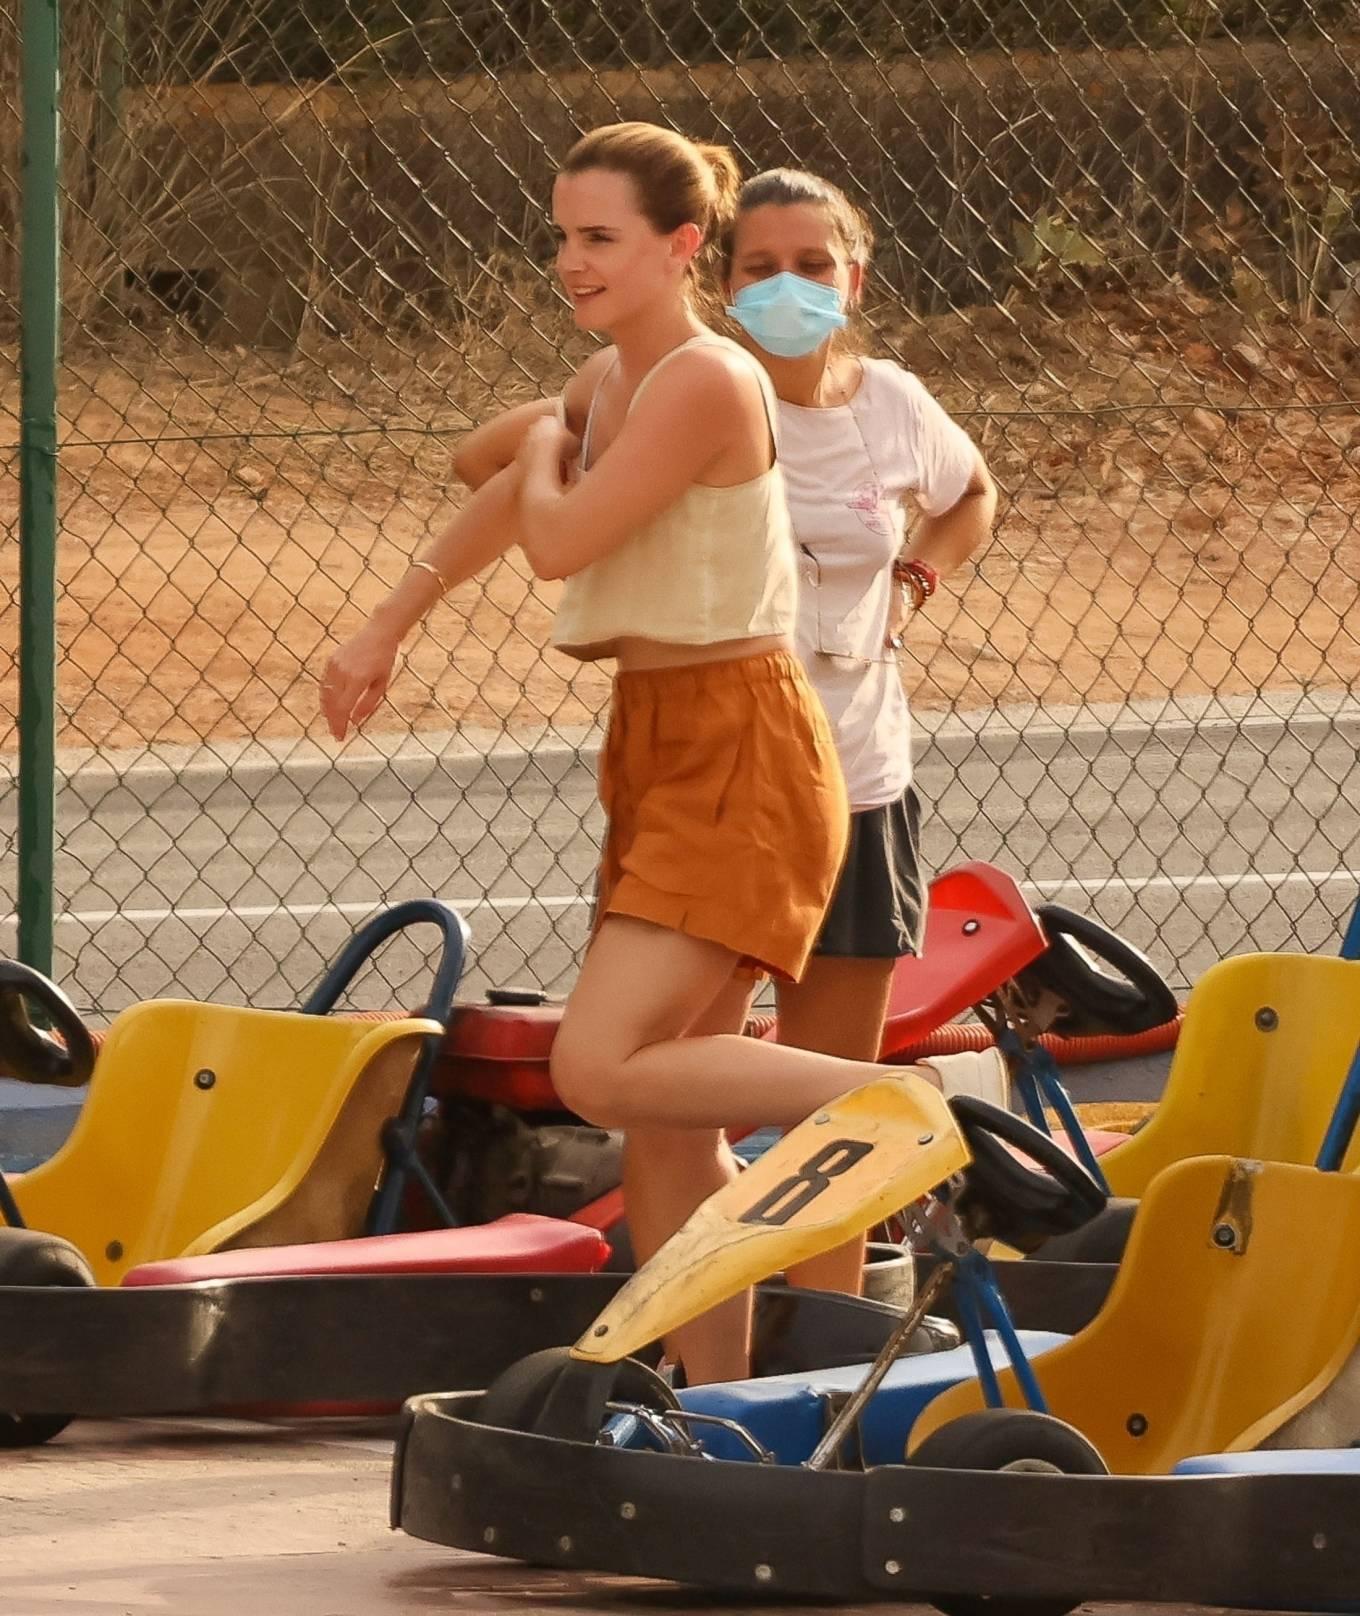 Emma Watson - Riding Go Karting in Ibiza